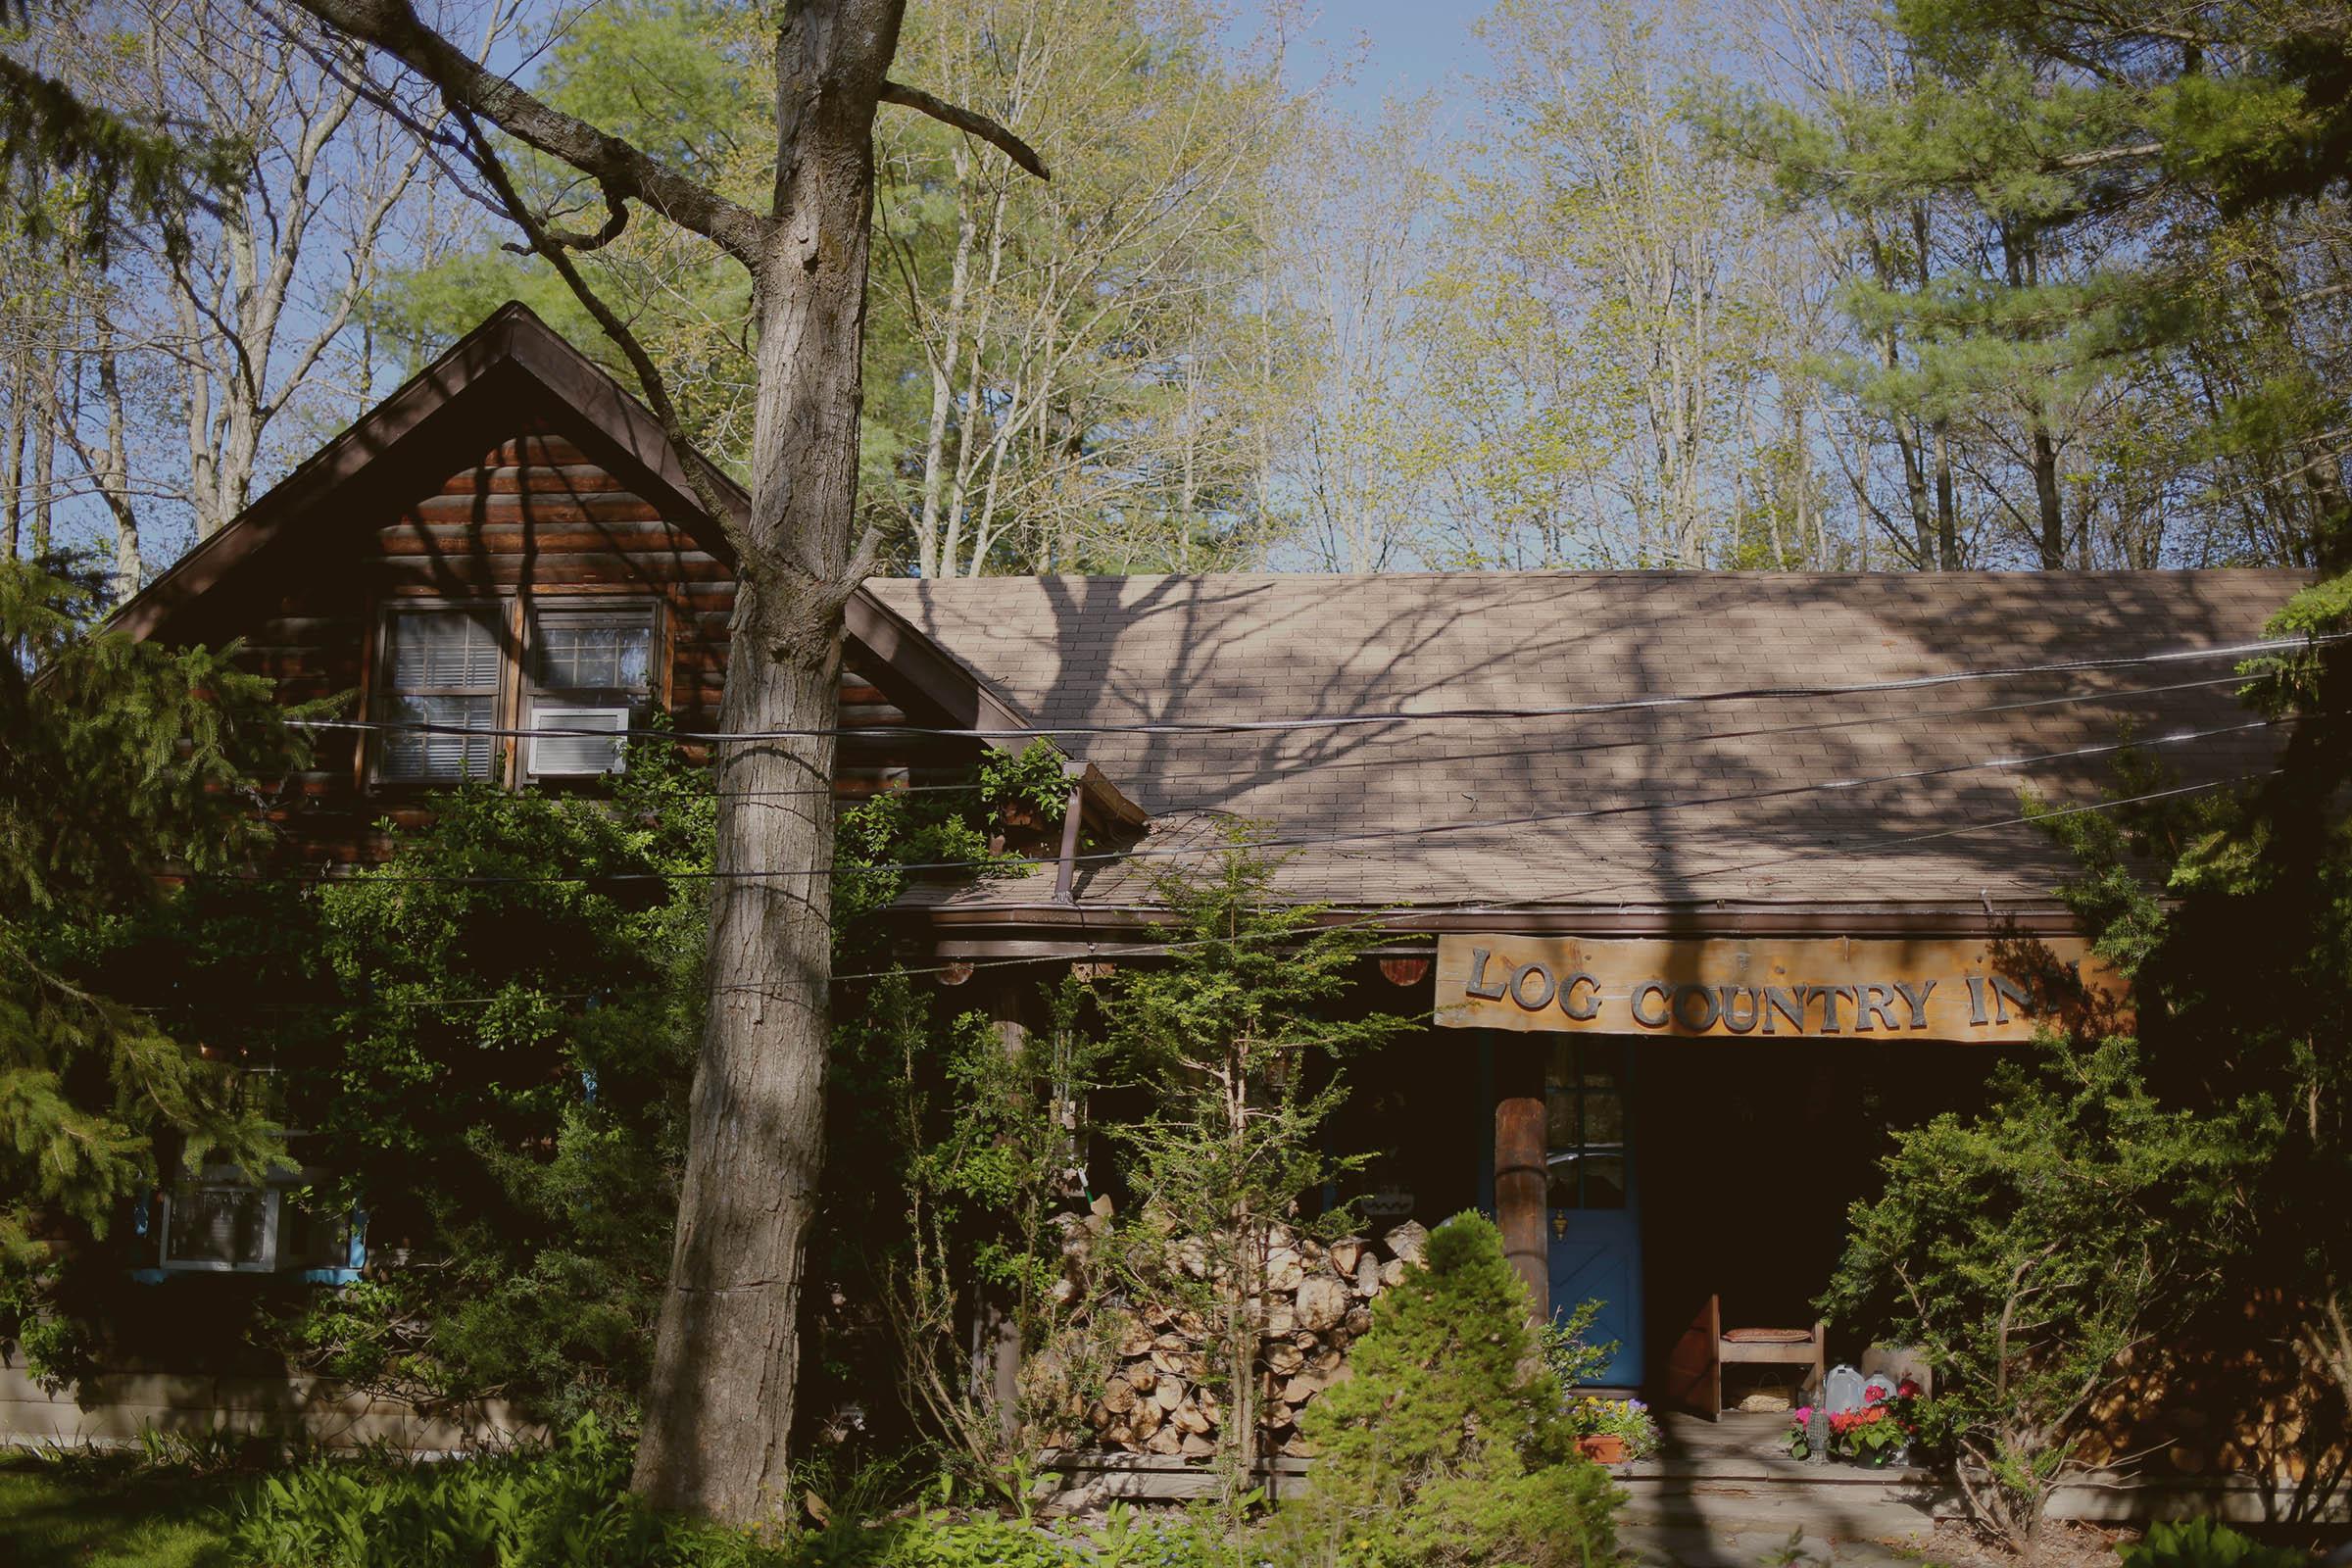 Ithaca B&B - Log Country Inn